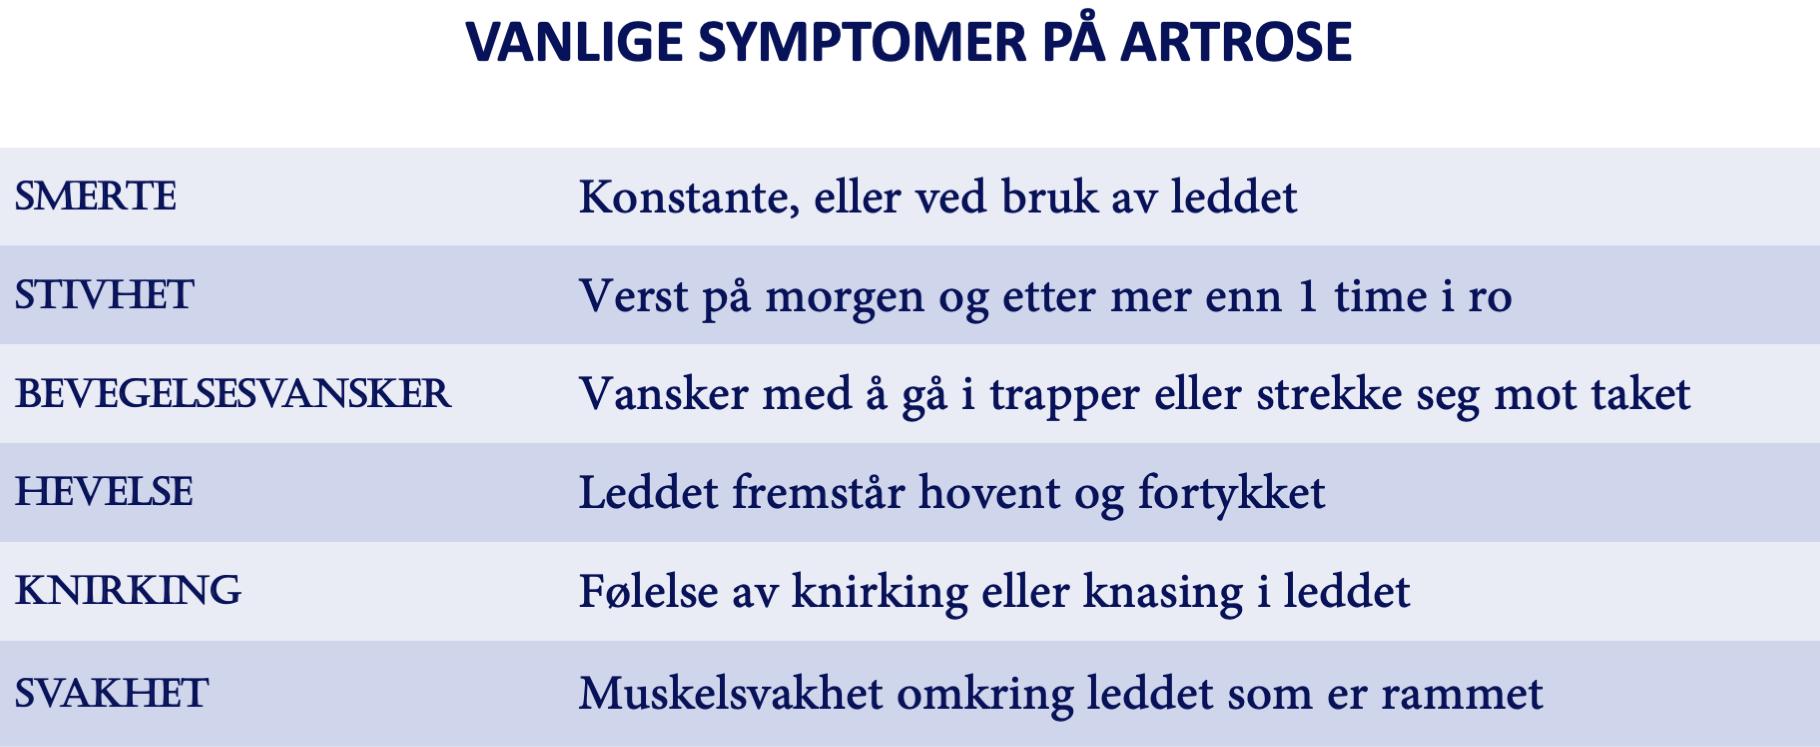 Symptomer til artrose symptomer